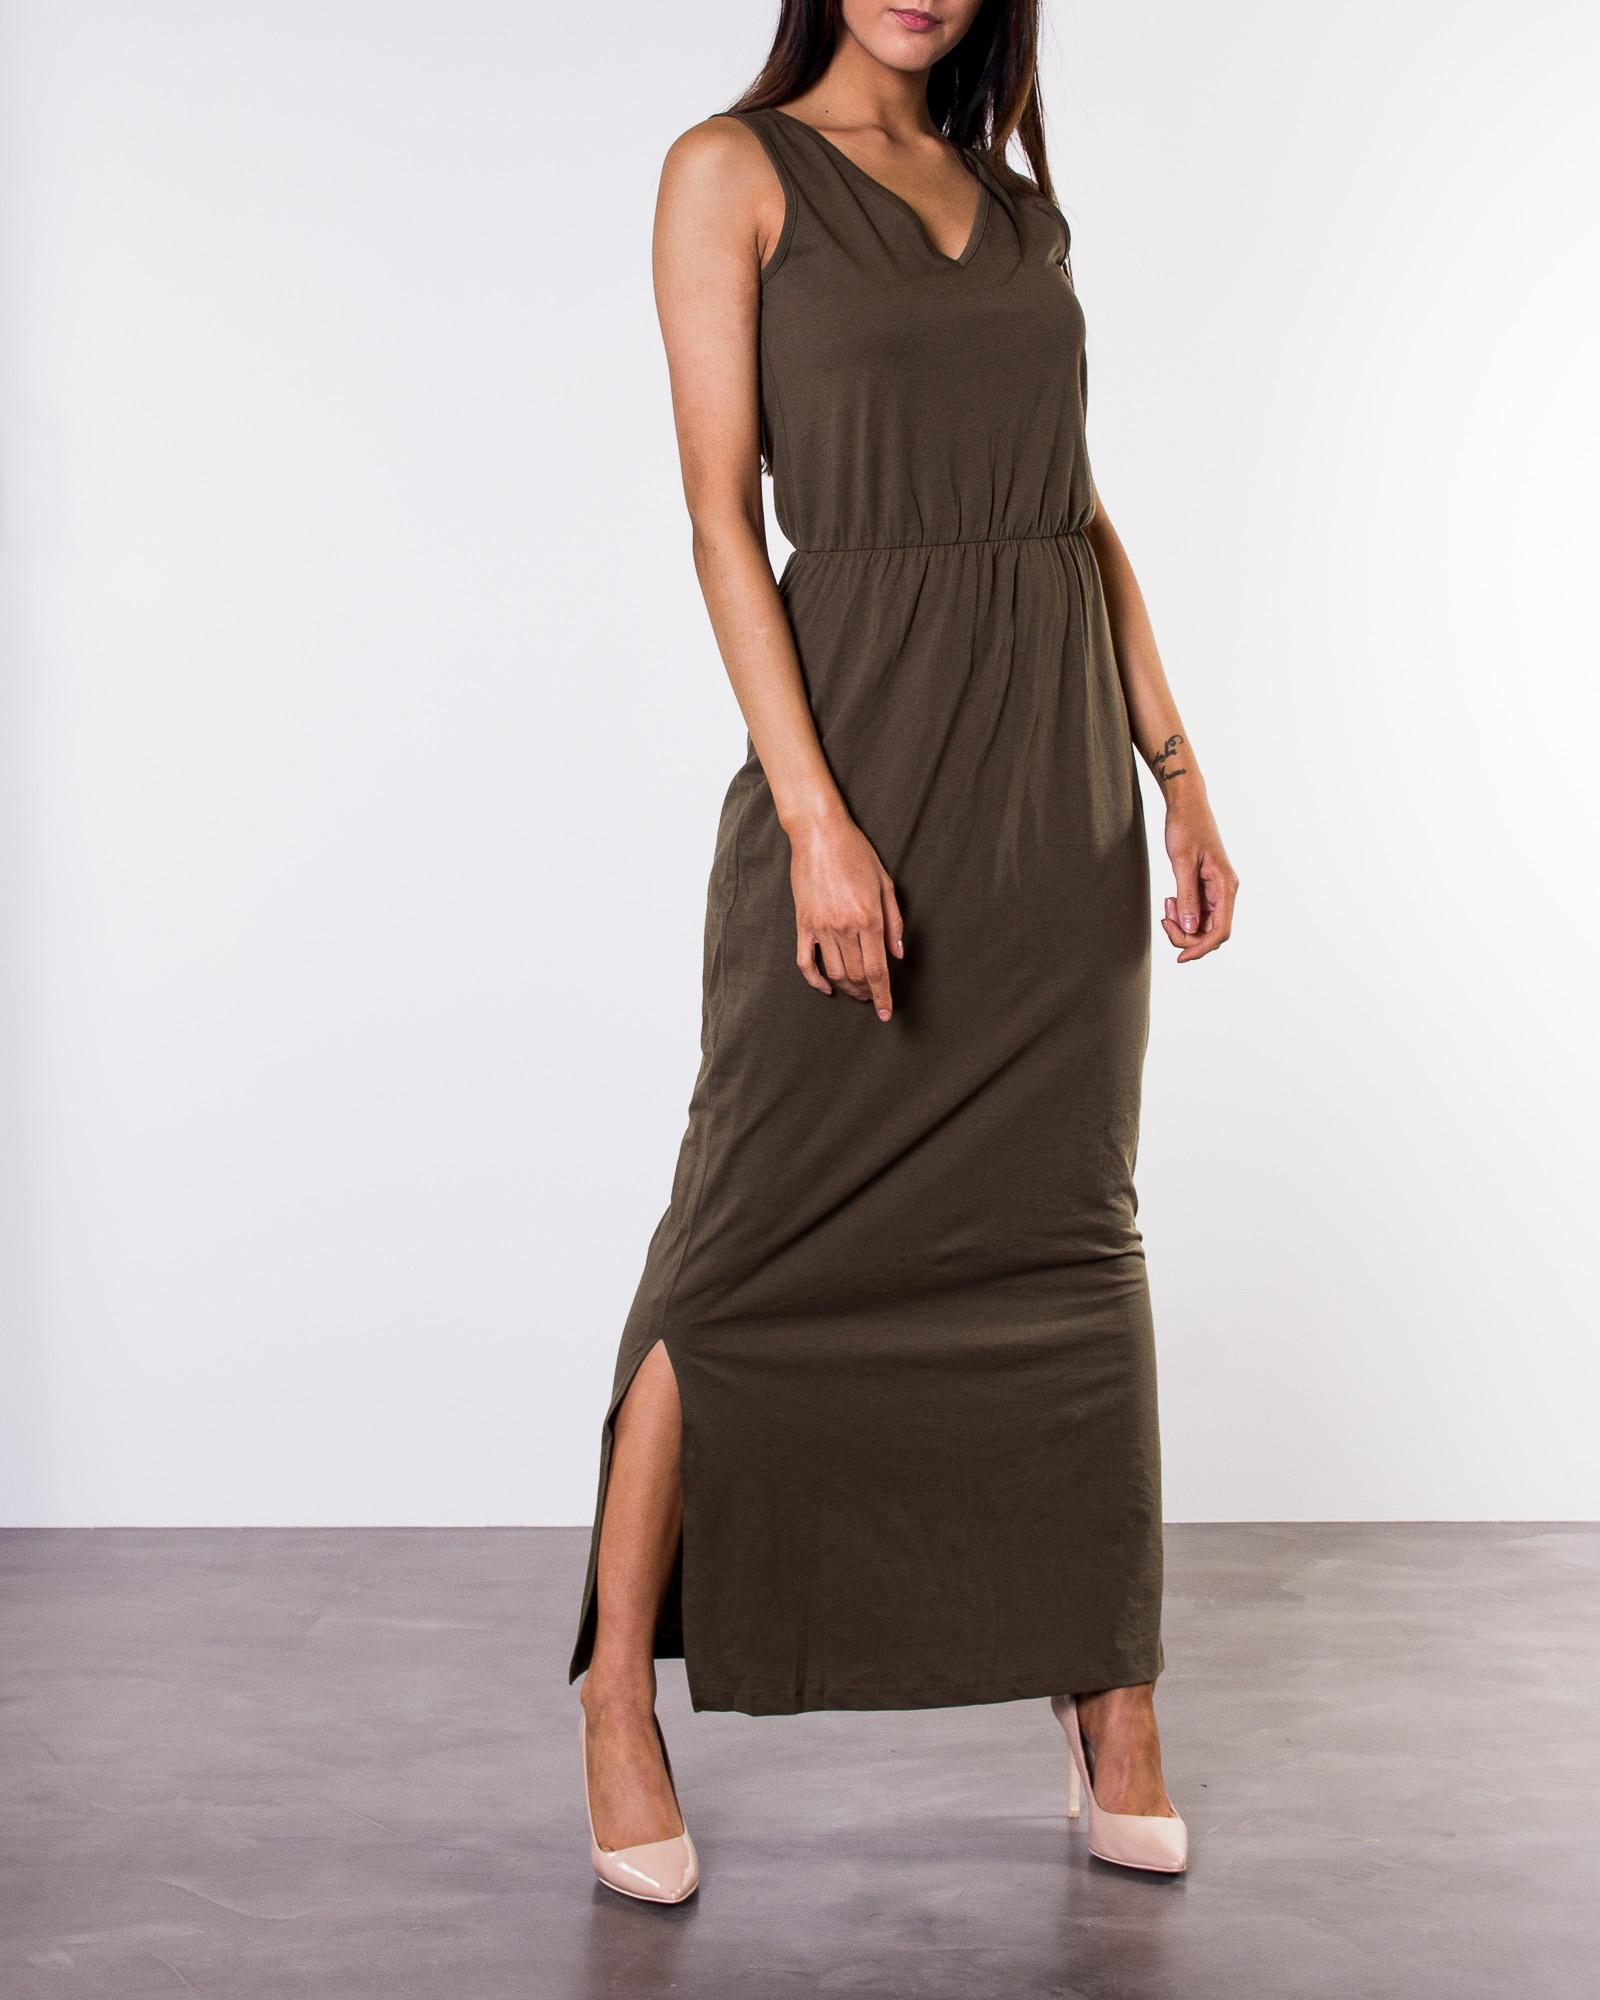 df0fedd38b62 Rebecca Ankle Dress Ivy Green